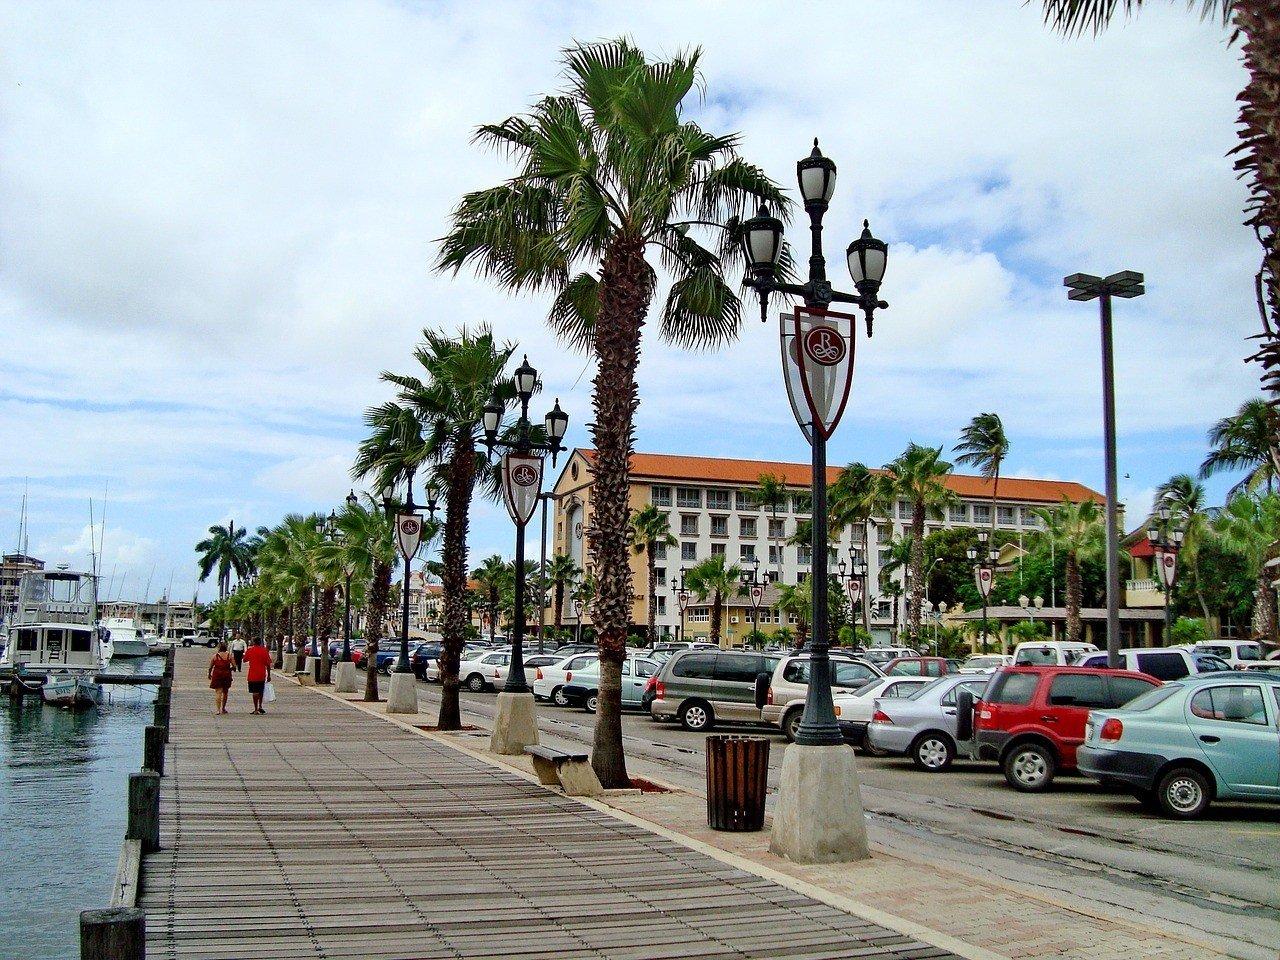 Is Aruba safe to live